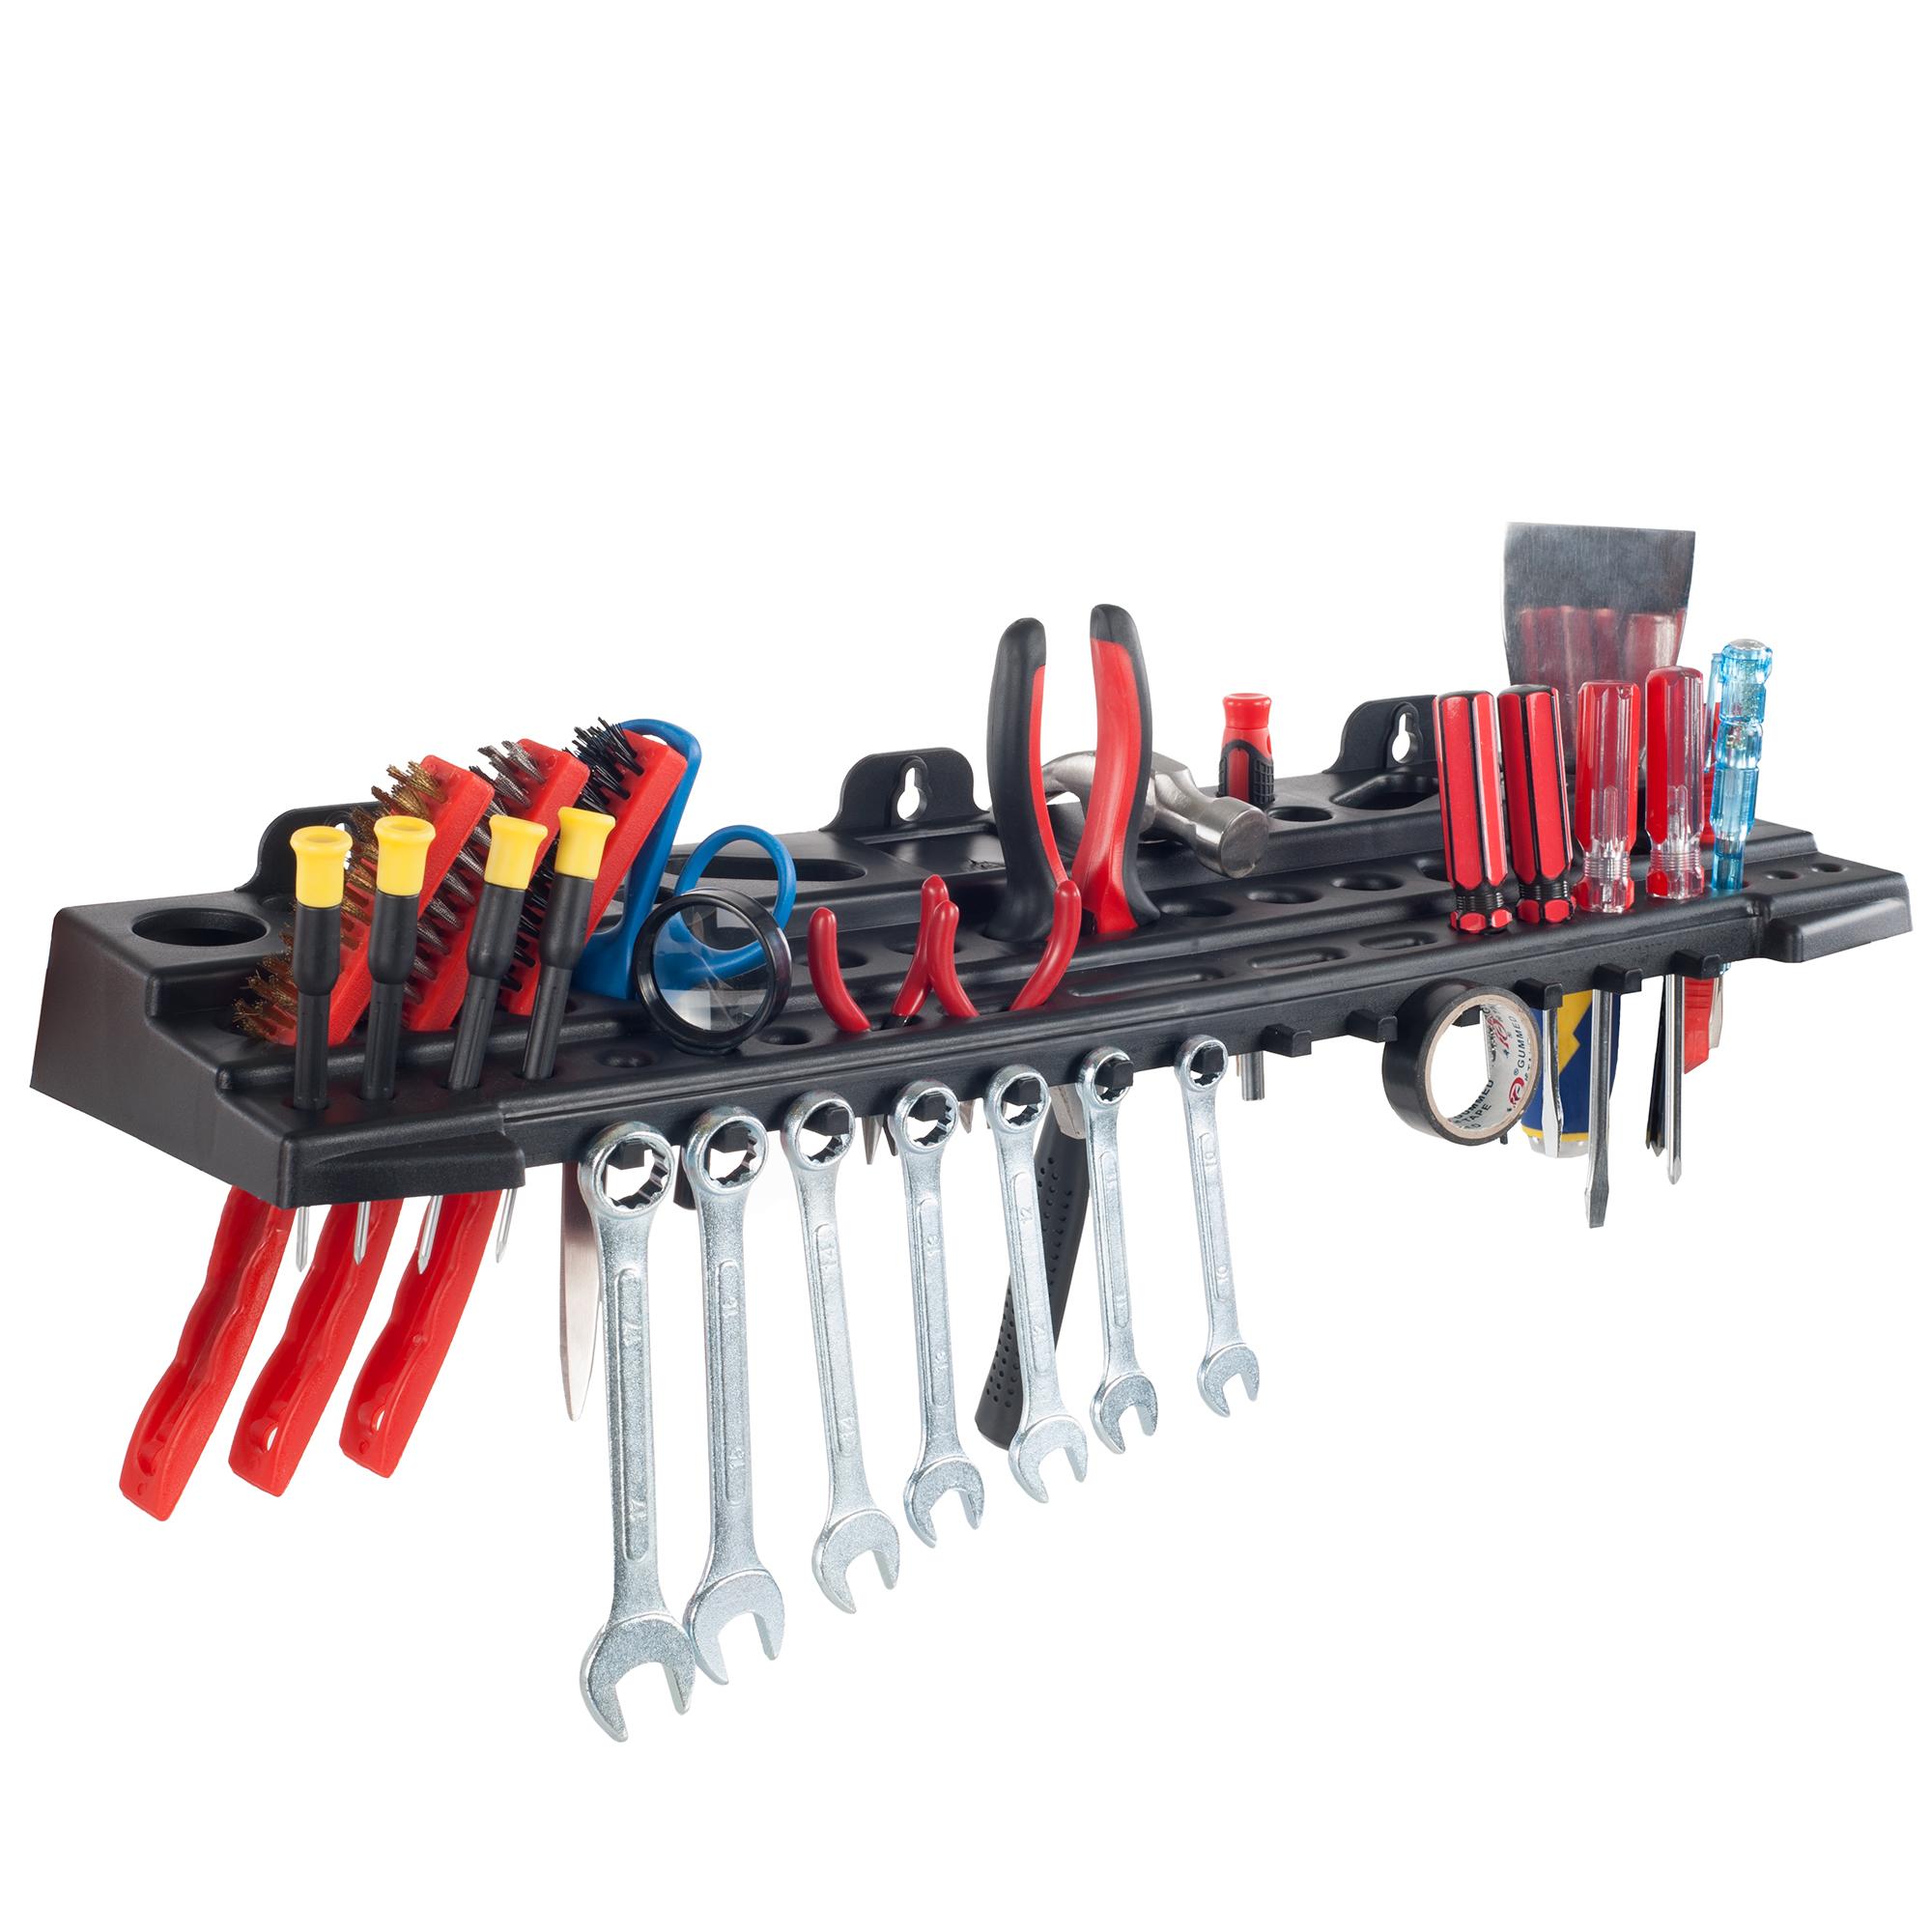 Stalwart 22 Inch Wall Mount Tool Organizer Shelf - Holds Over 60 Tools c1e68f9dcdb3